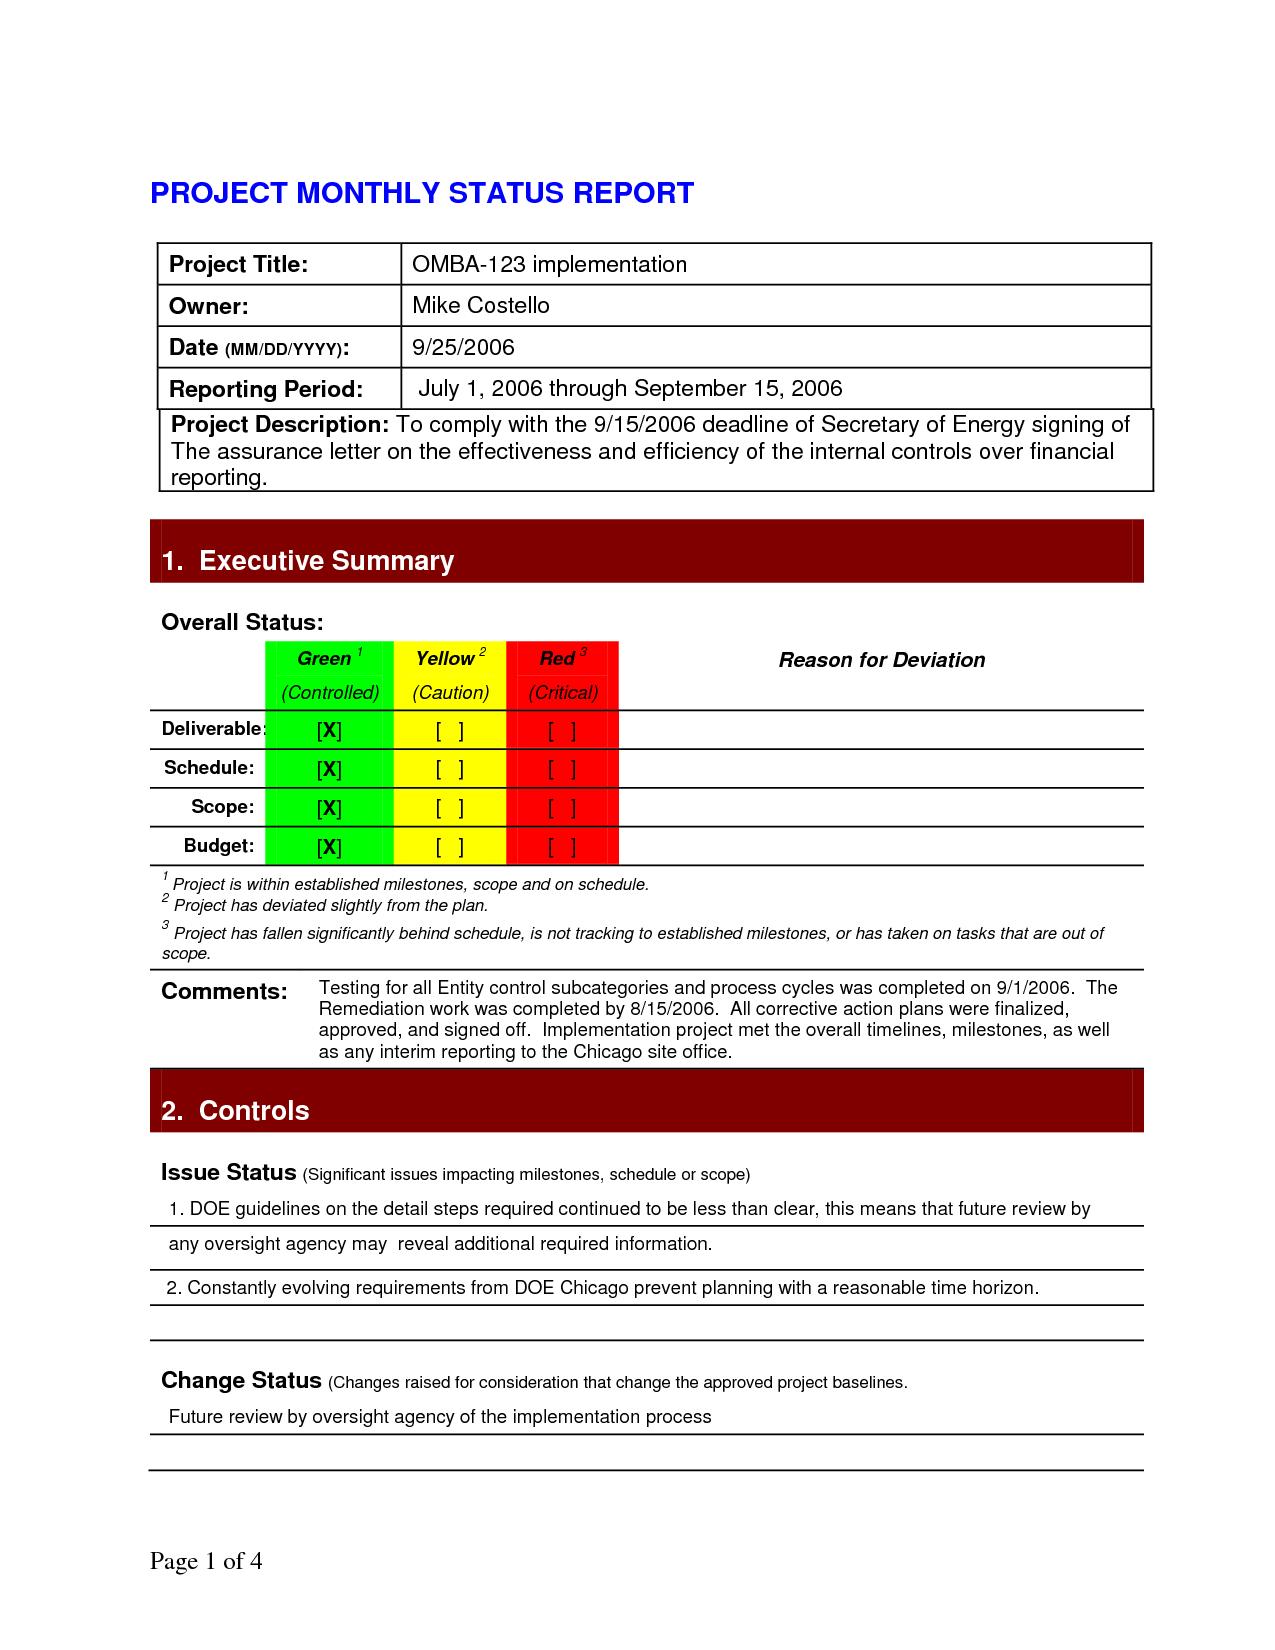 Pinlesedi Matlholwa On Templates | Progress Report Pertaining To Testing Daily Status Report Template